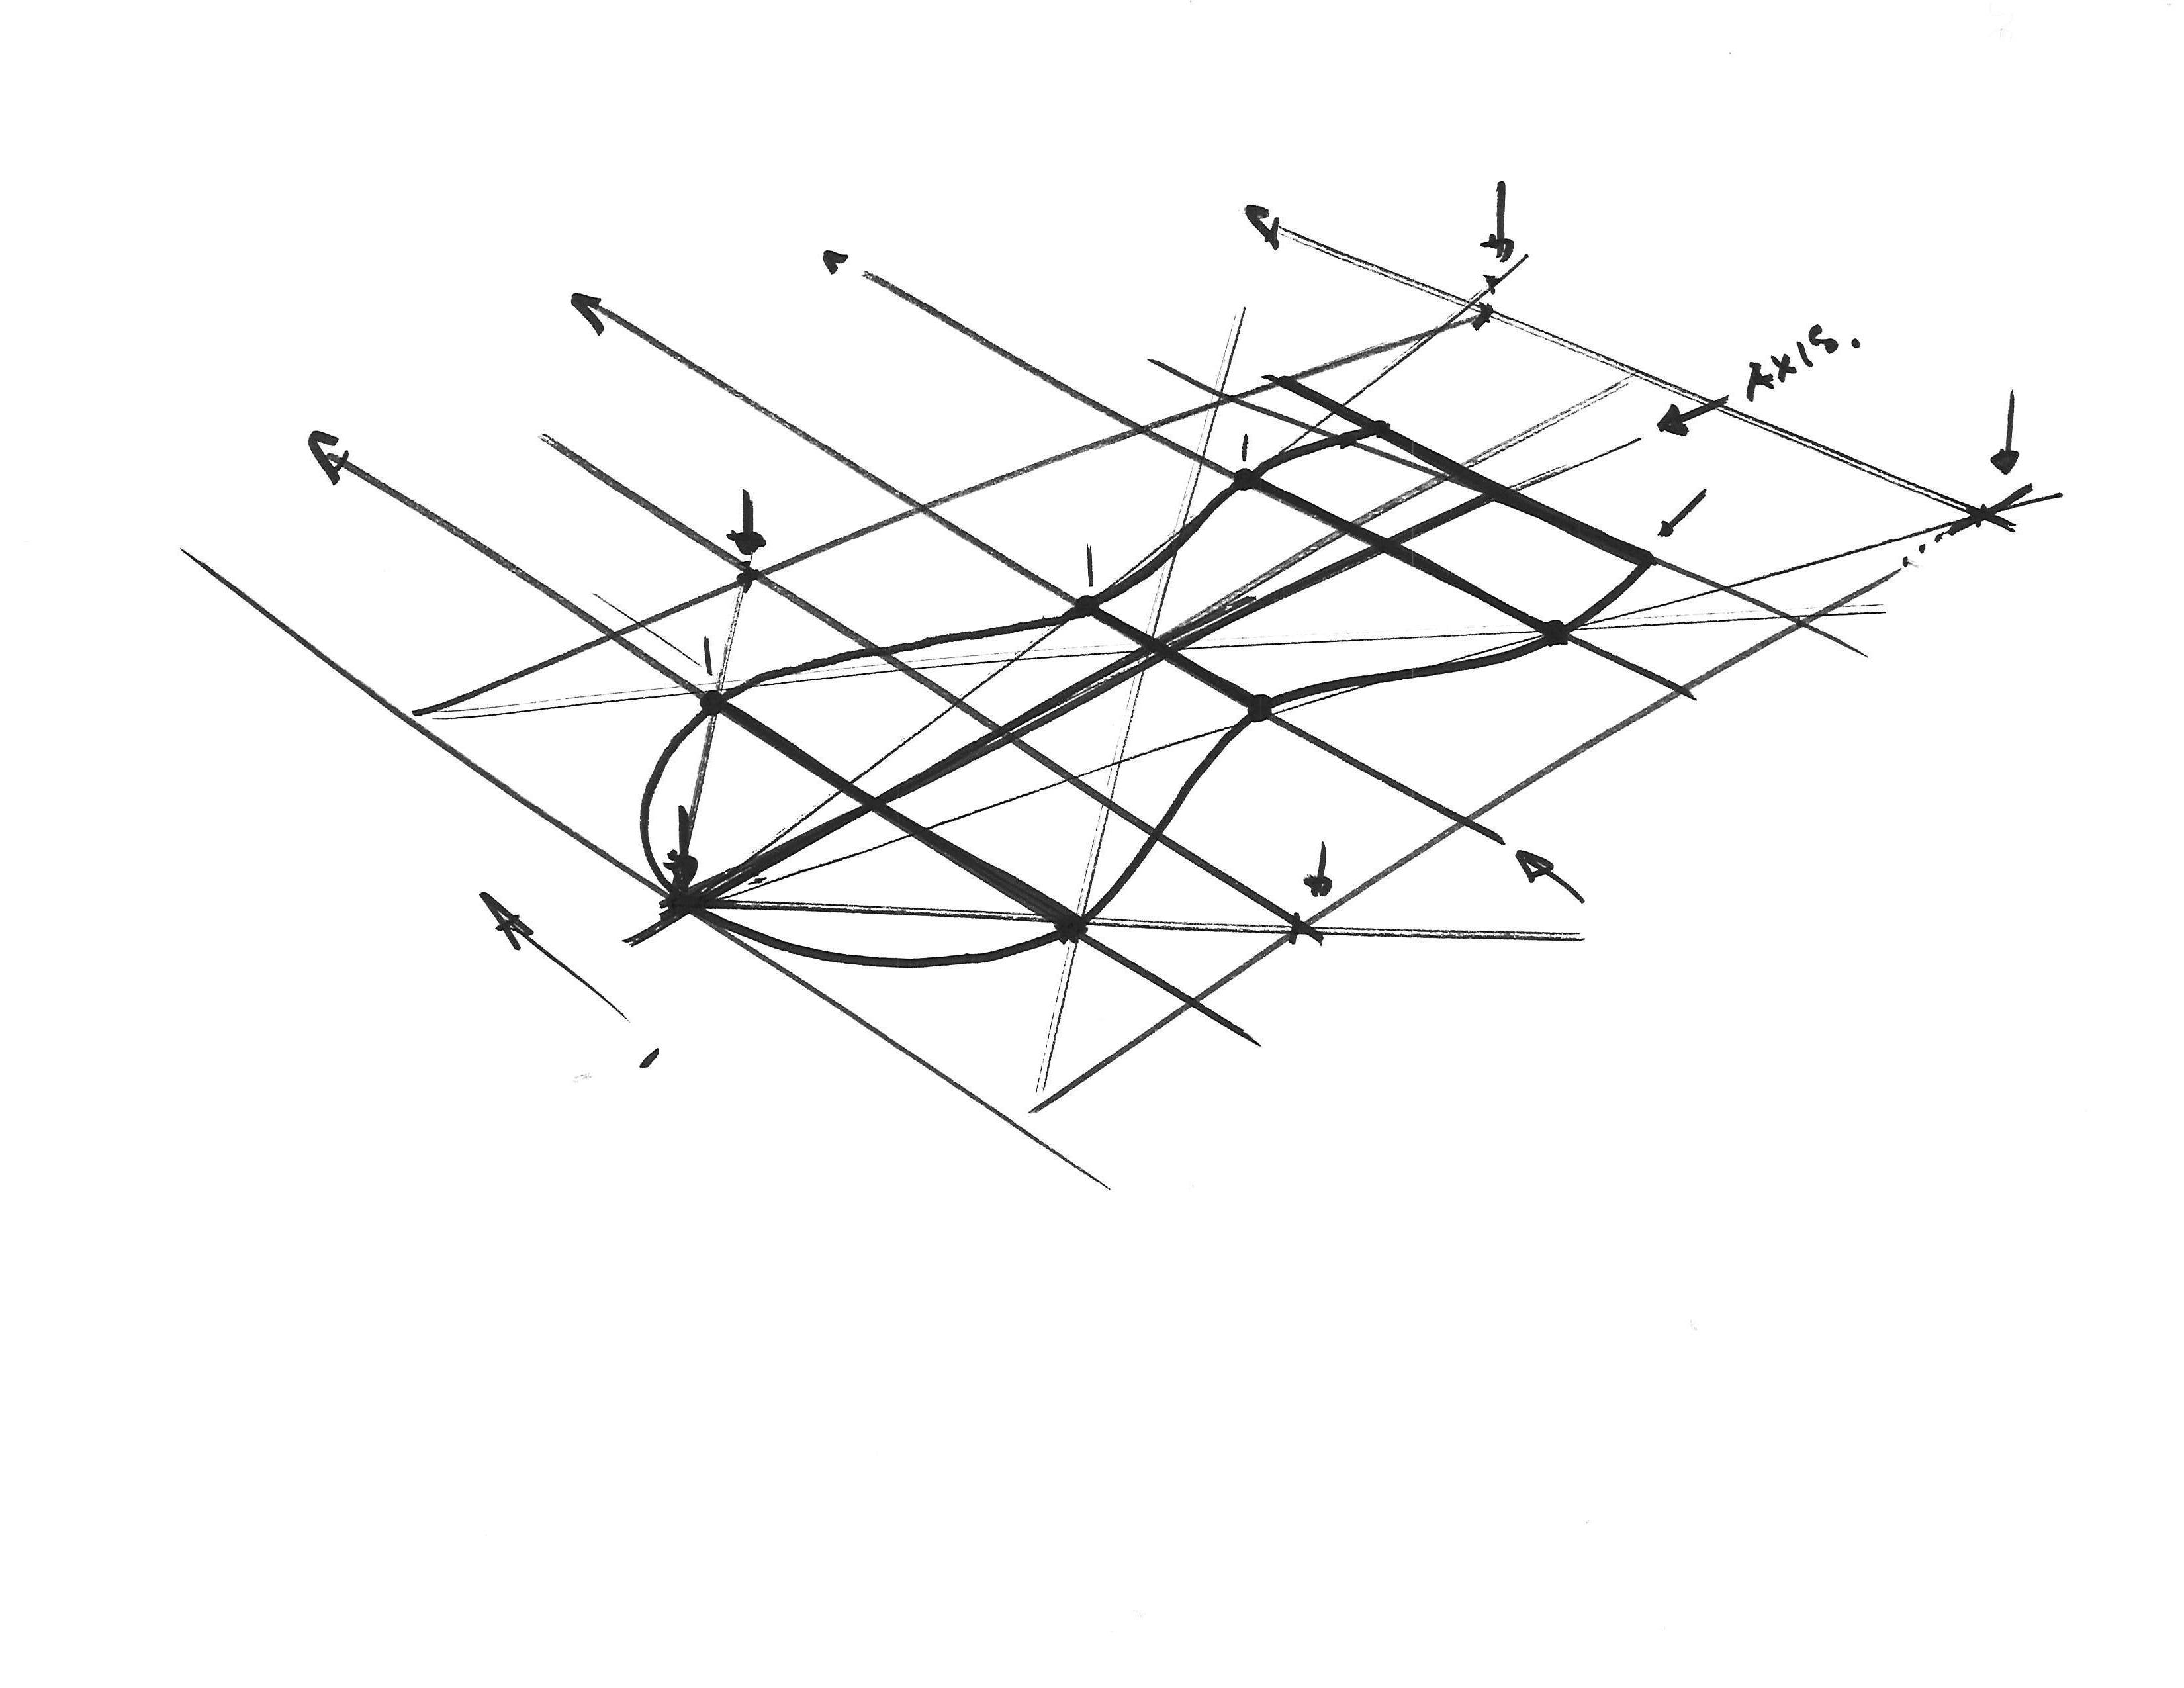 3300x2550 37025702 Concept Sketching Amp Rendering